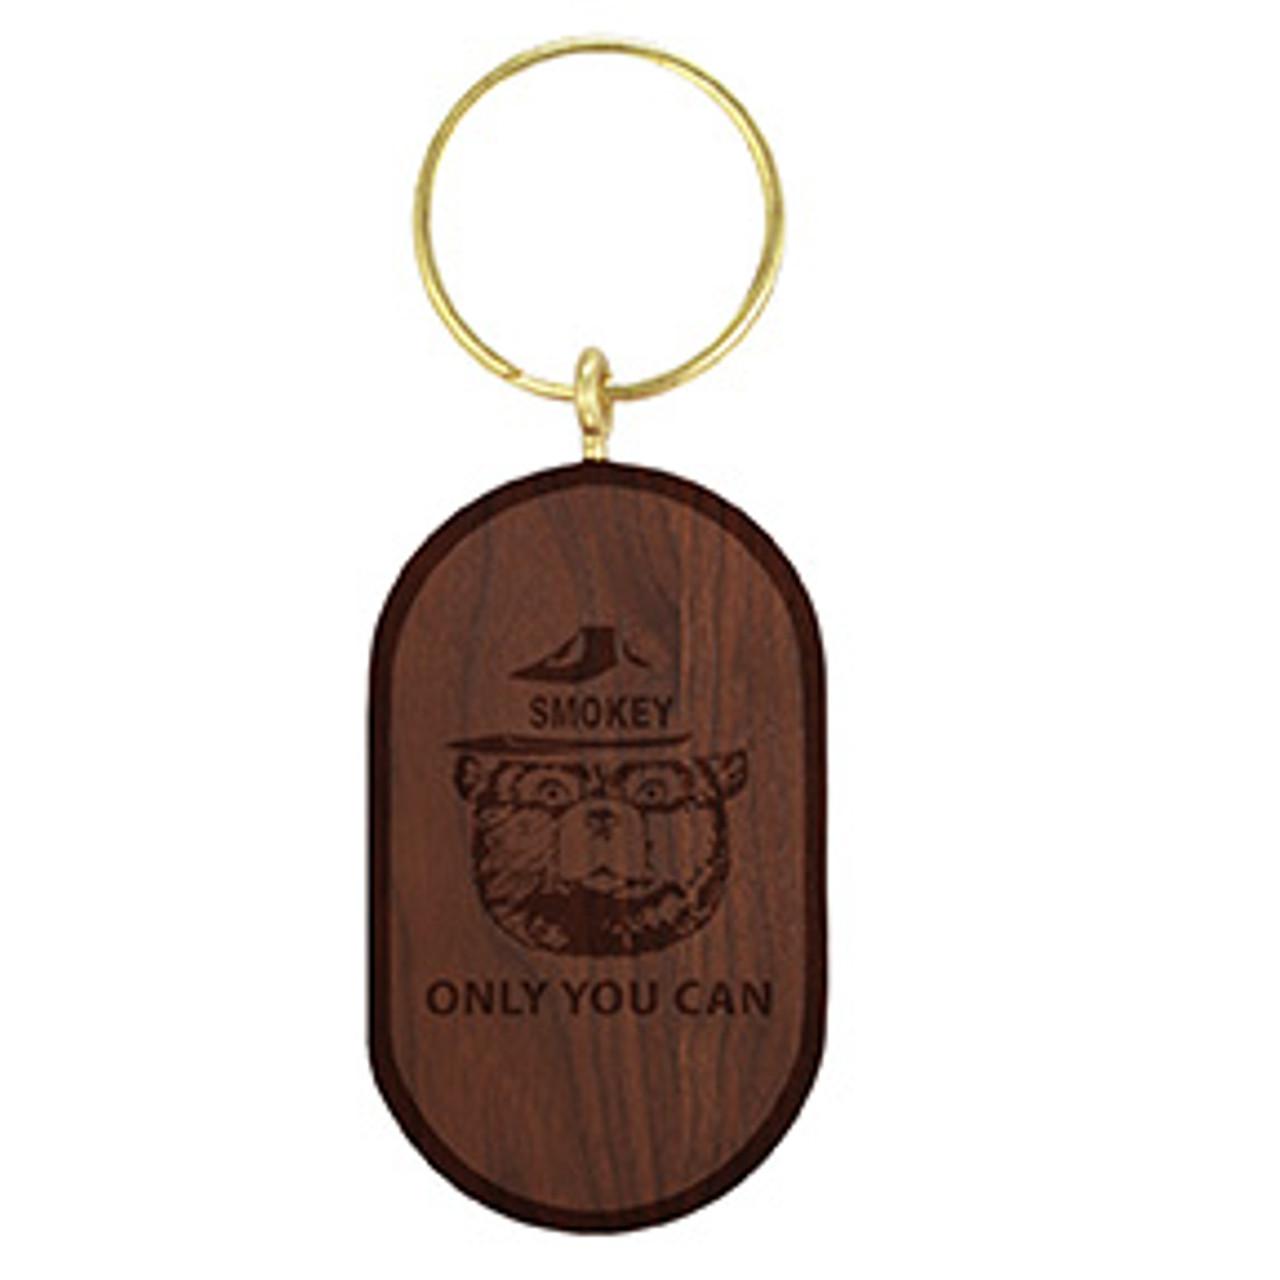 Oval Solid Wood Key Tag - Walnut